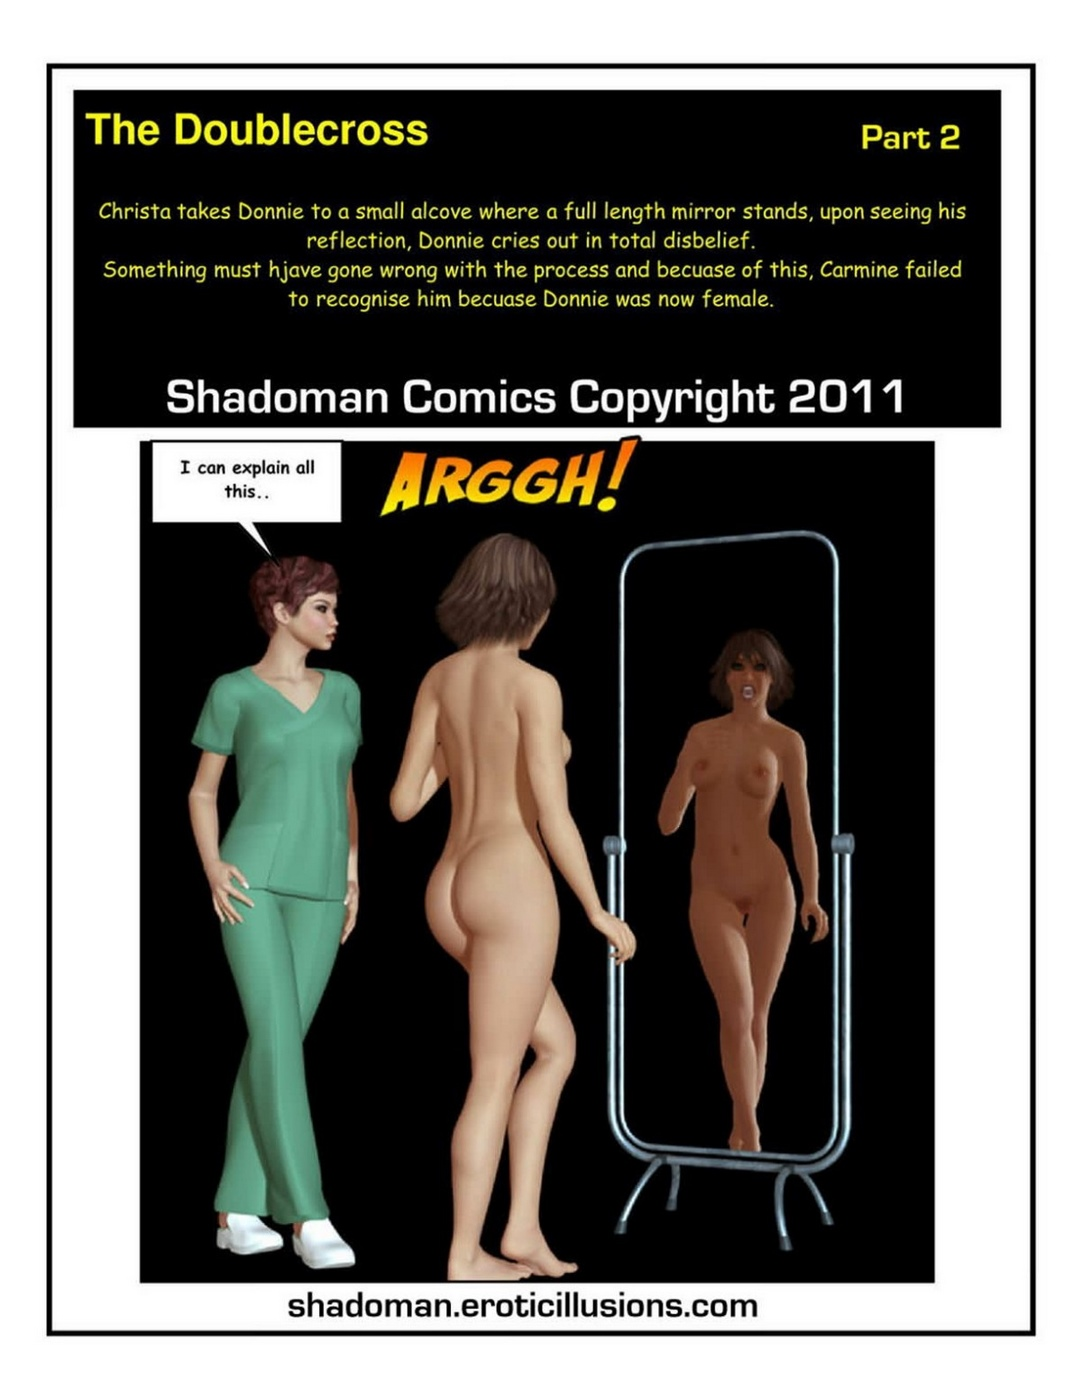 Porn Comics - Shadoman – The doublecross 2 porn comics 8 muses